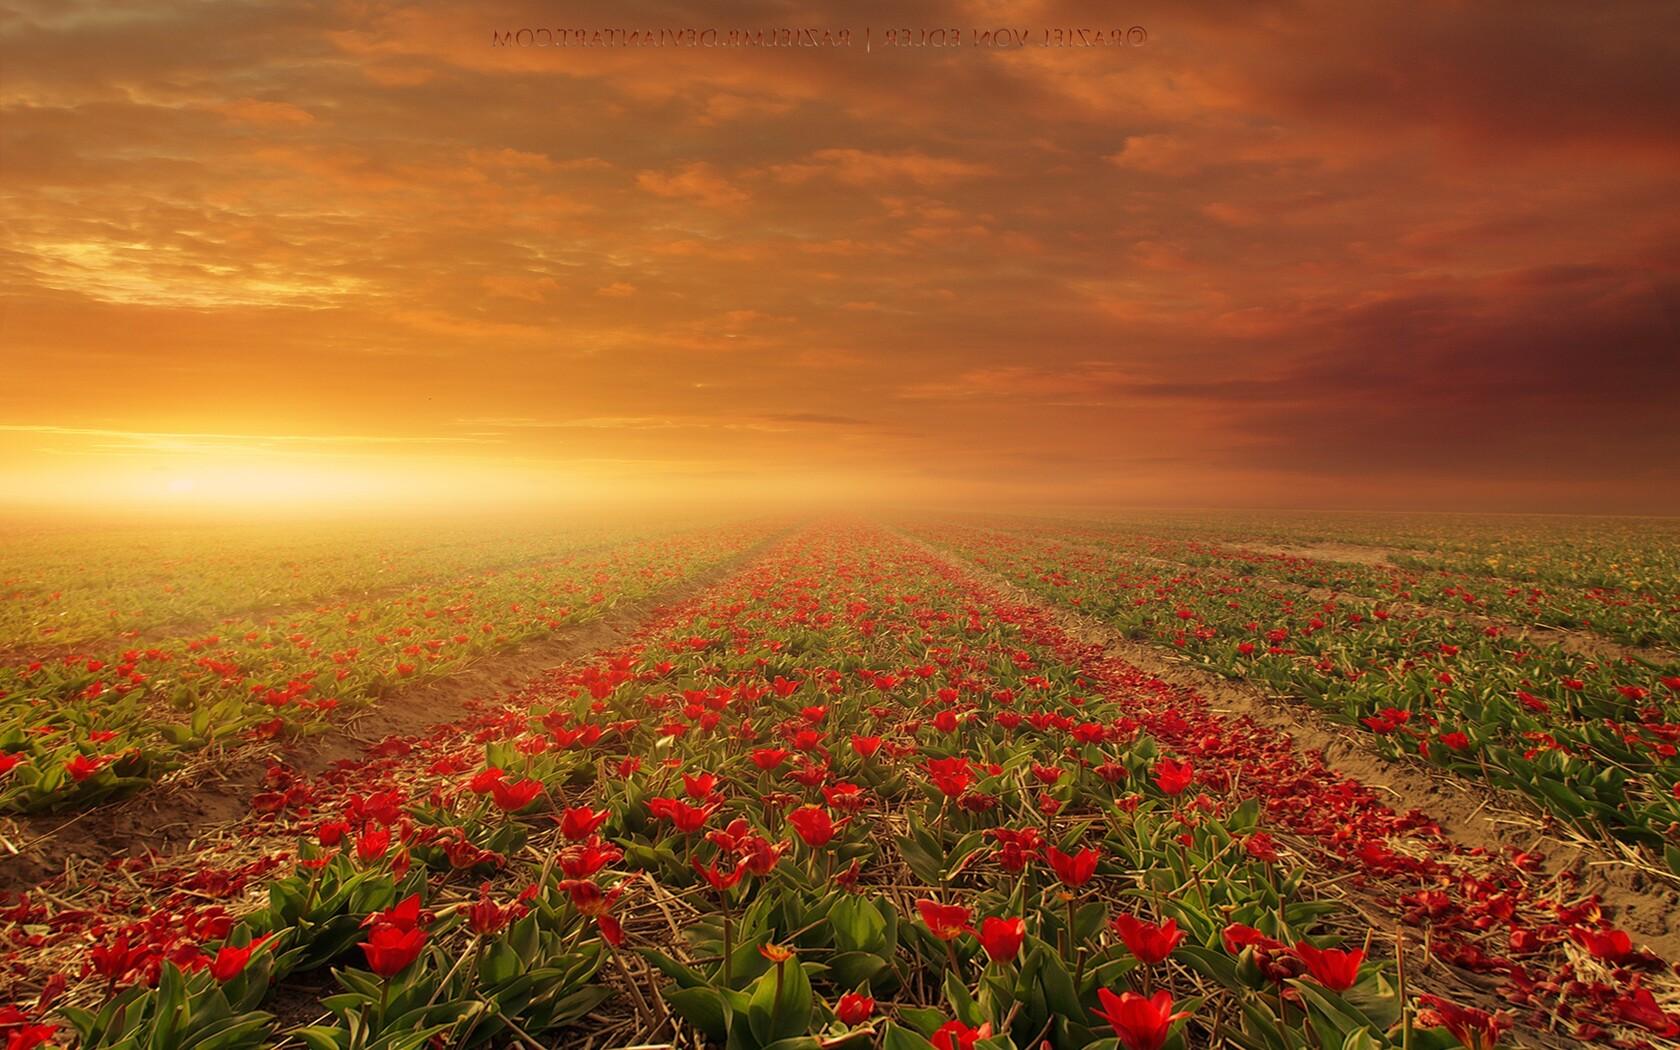 flower-fields-nature.jpg